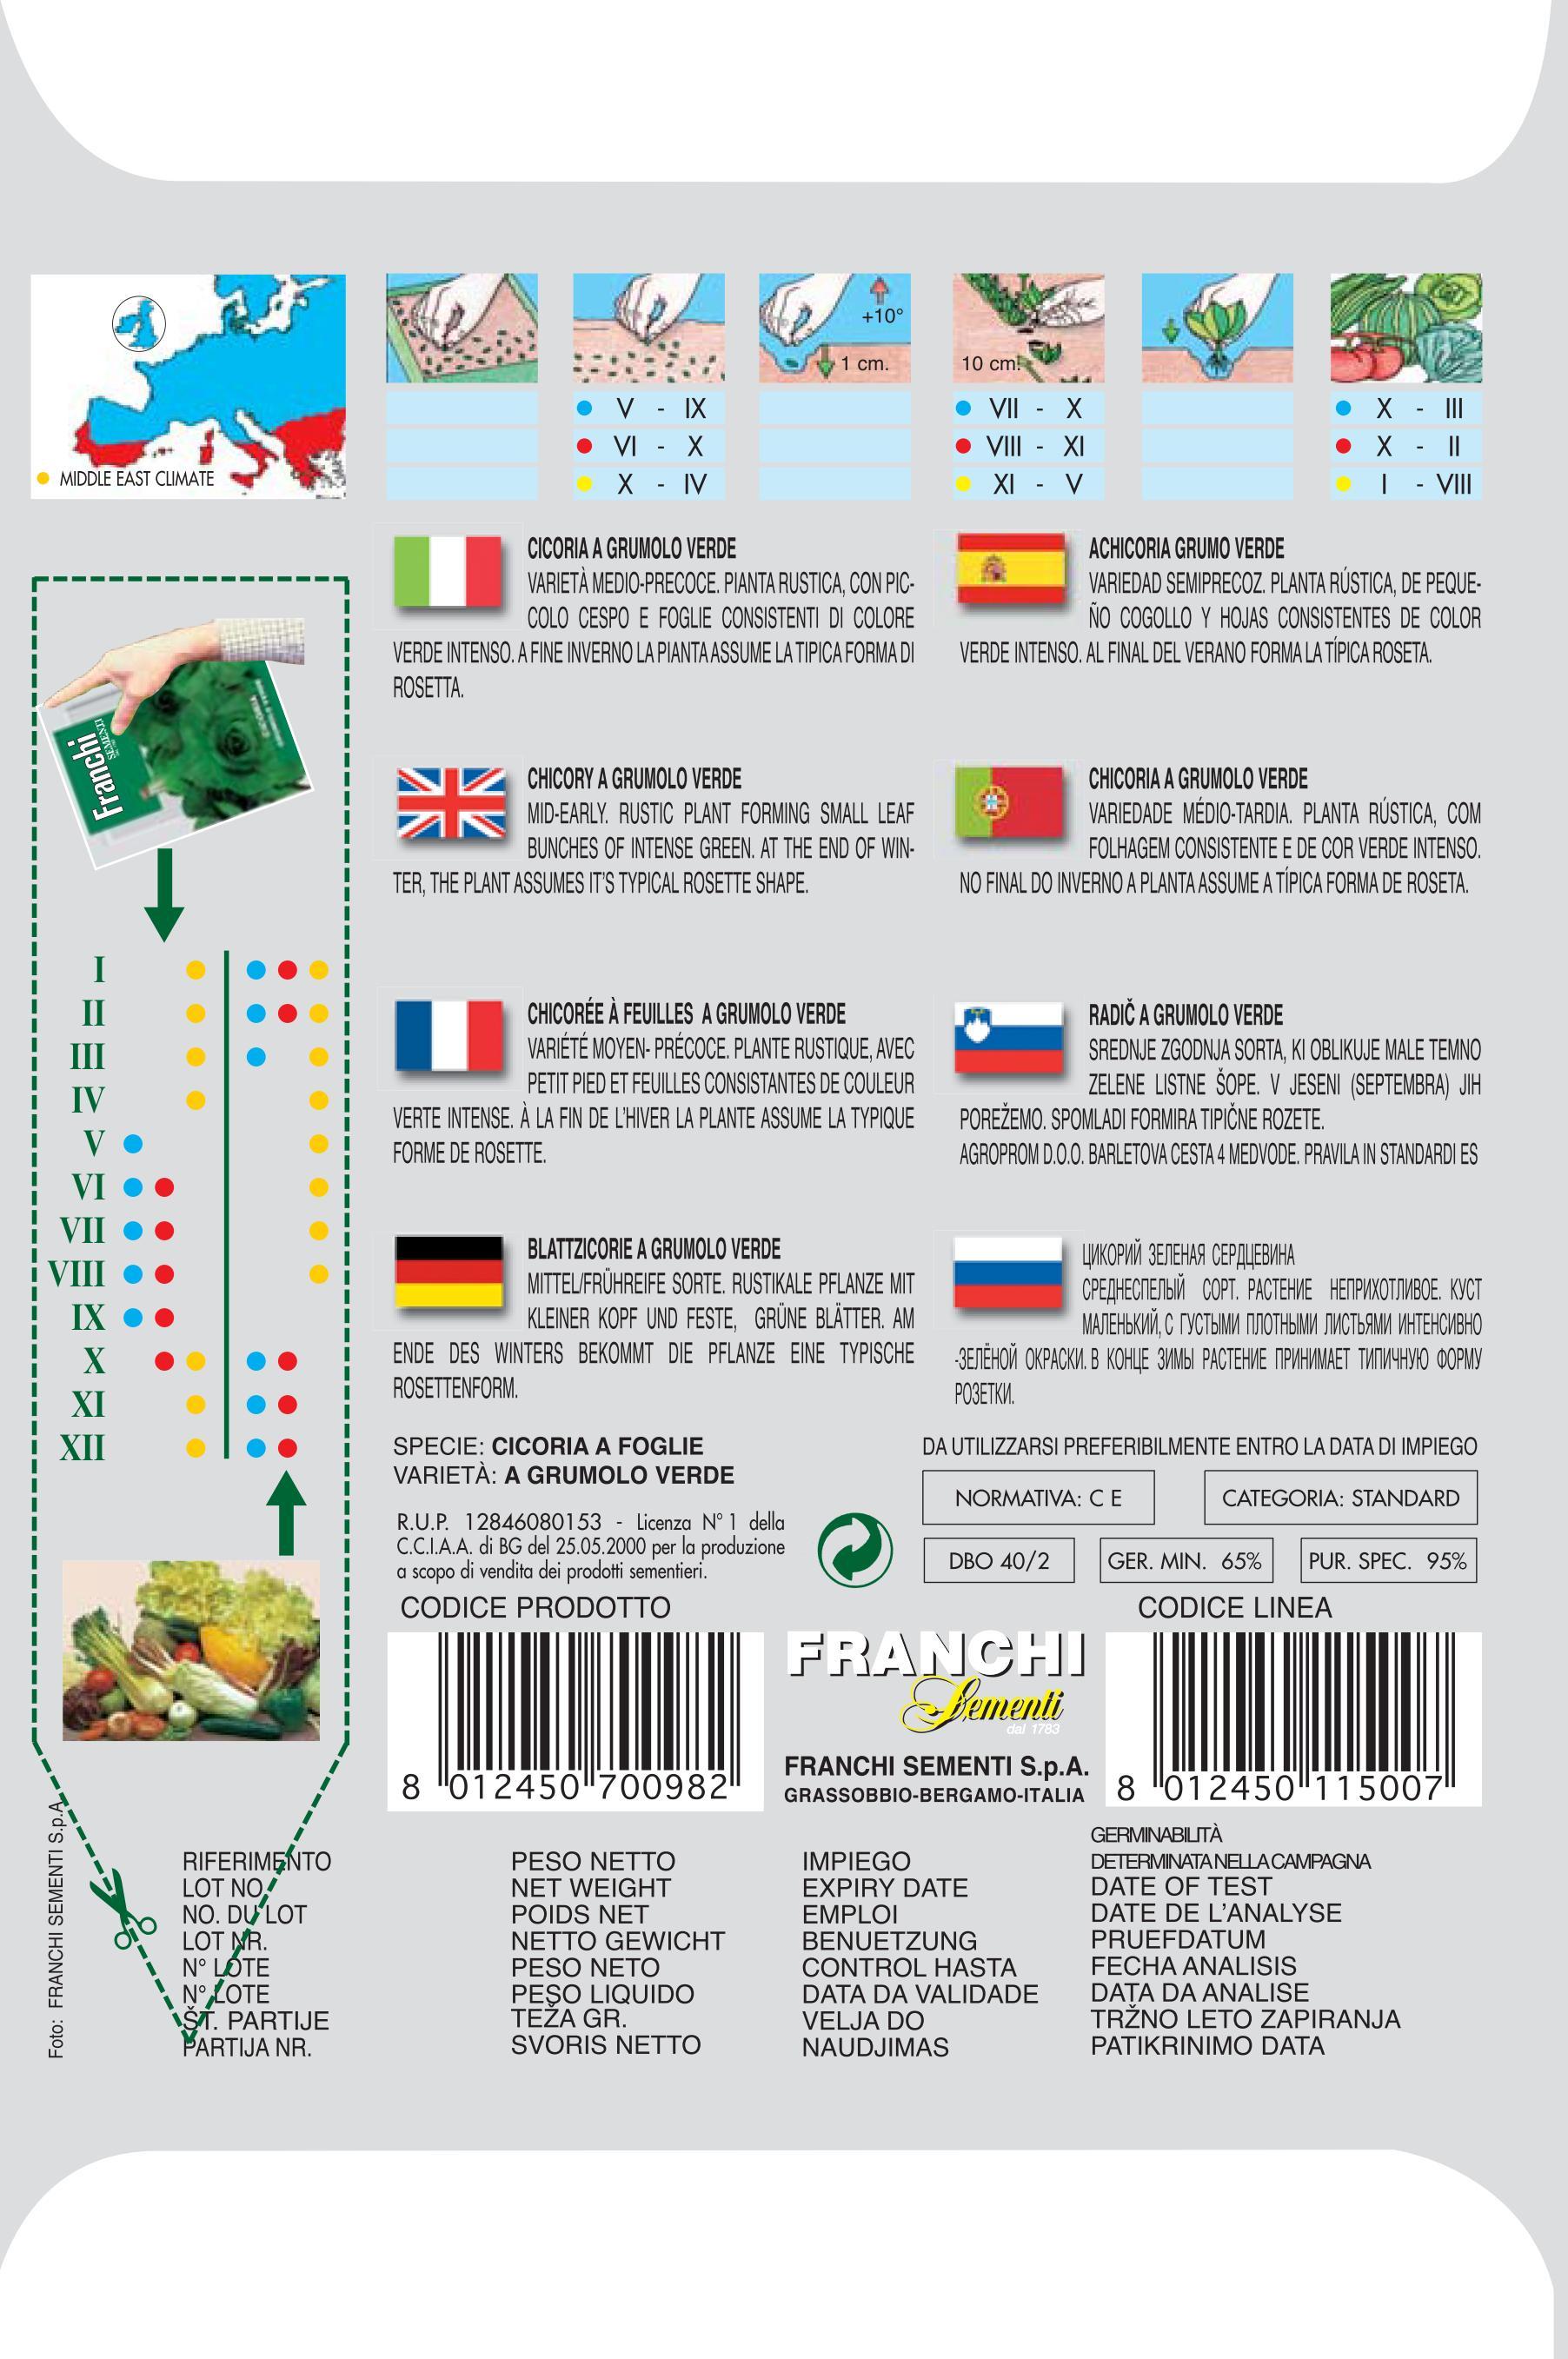 Chicory Grumolo Verde